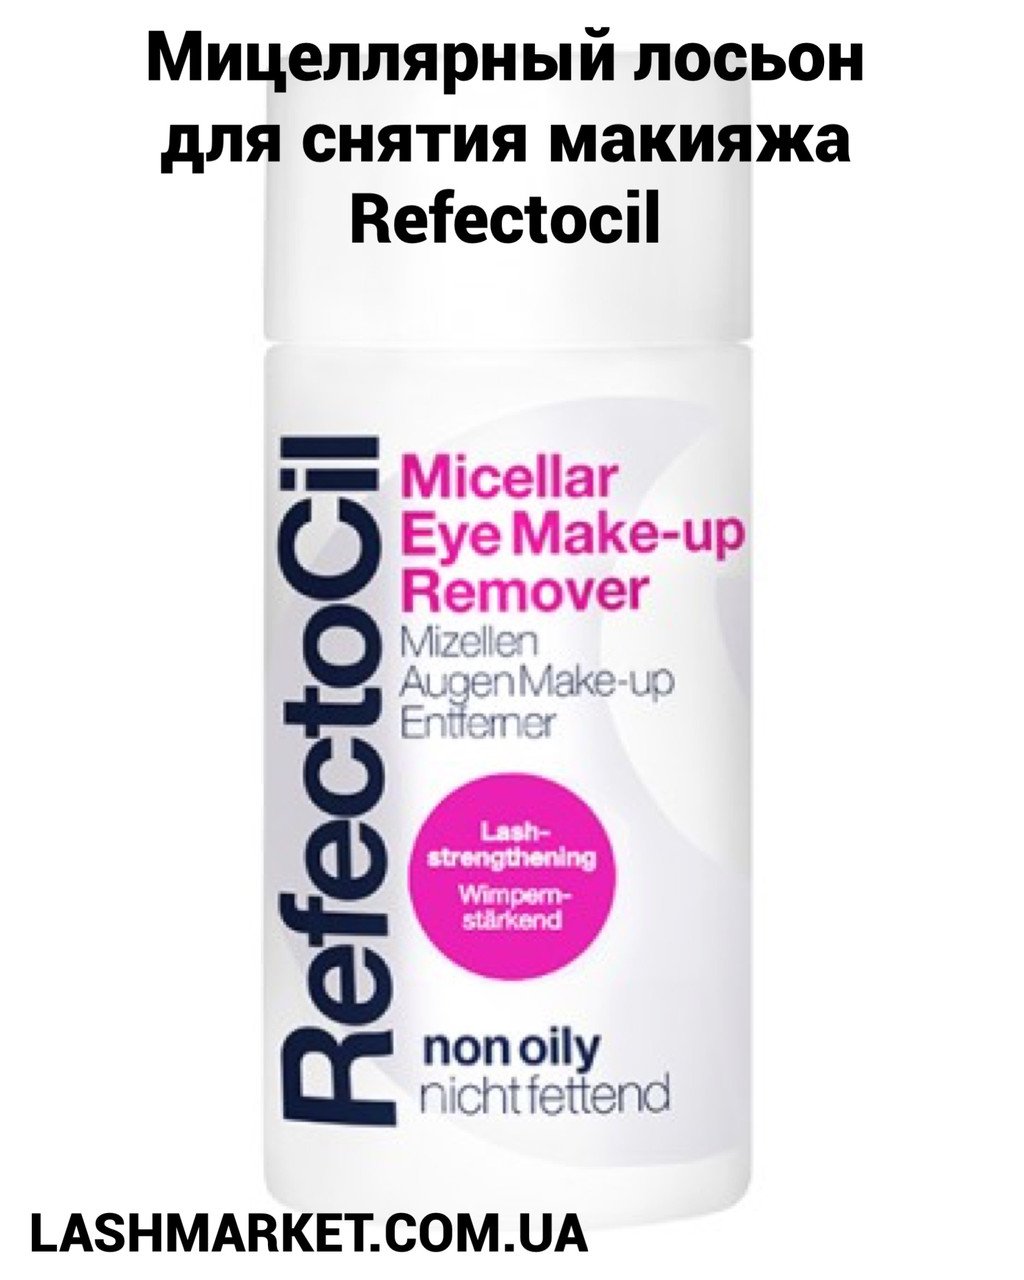 Мицеллярный лосьон для снятия макияжа Refectocil, 150 мл